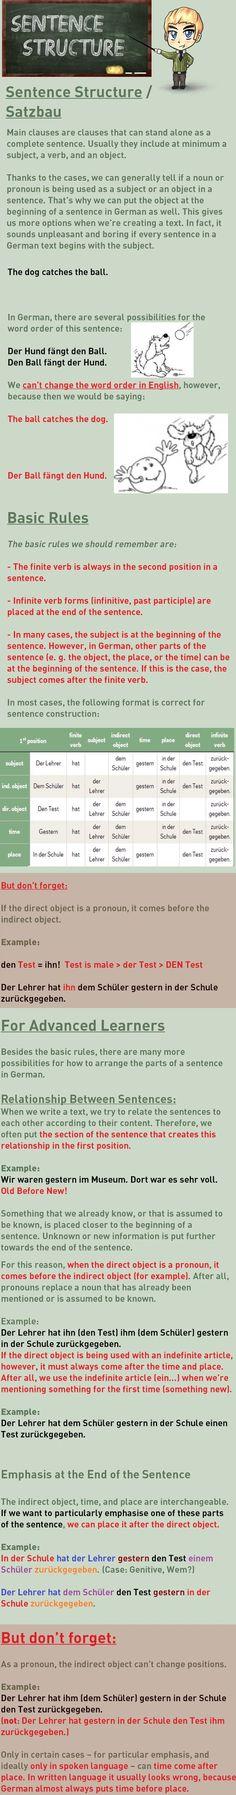 Sentence Structure/ Satzbau